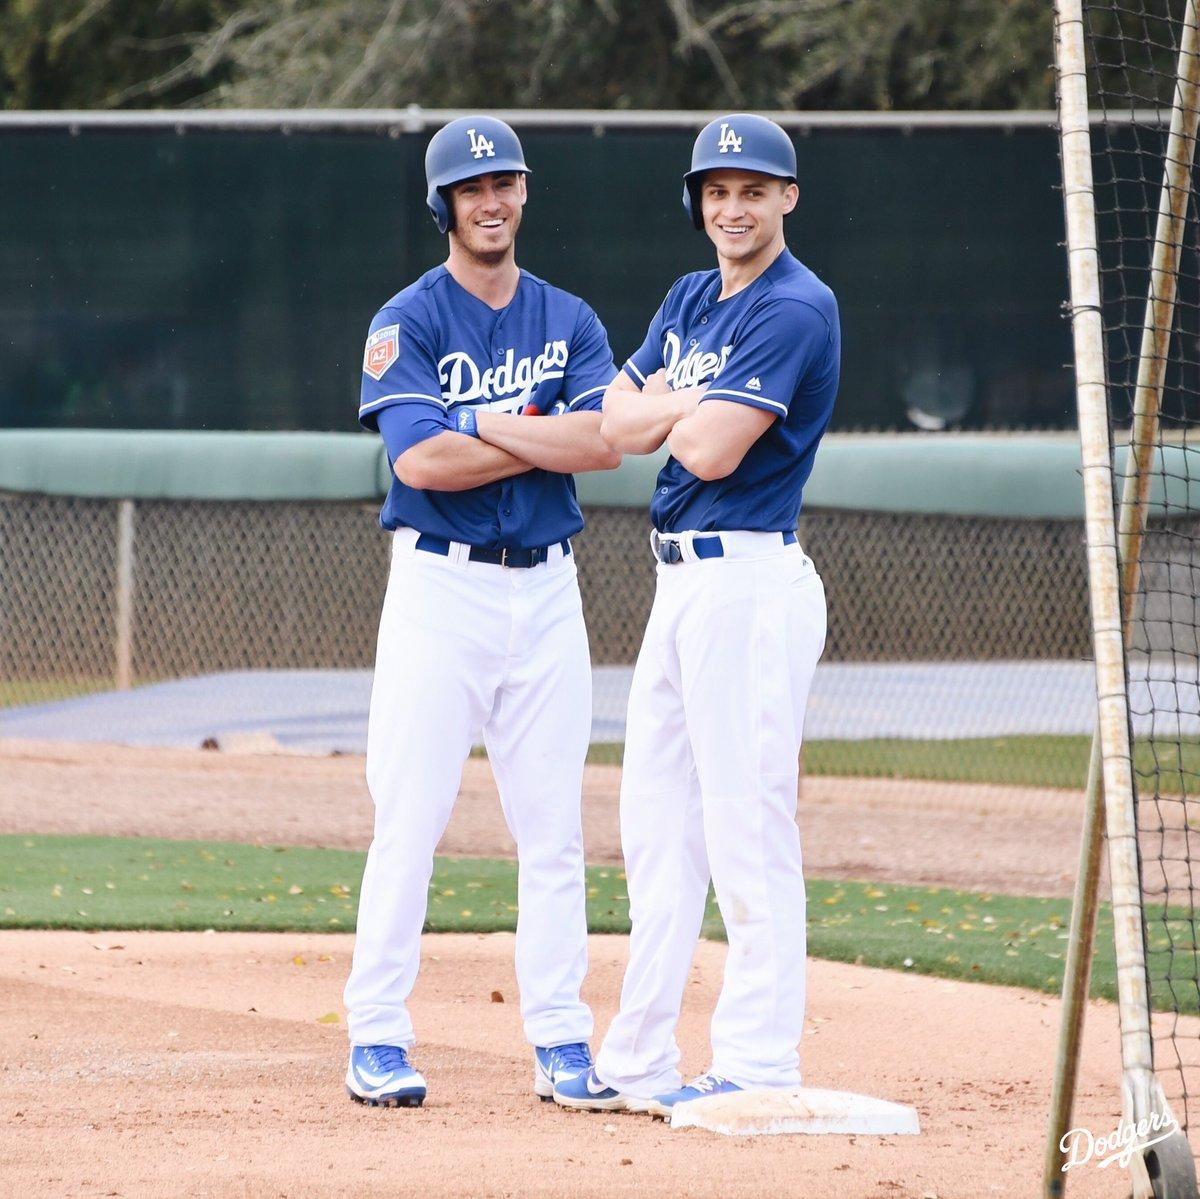 #FridayFeeling because baseball returns this month! #DodgersST